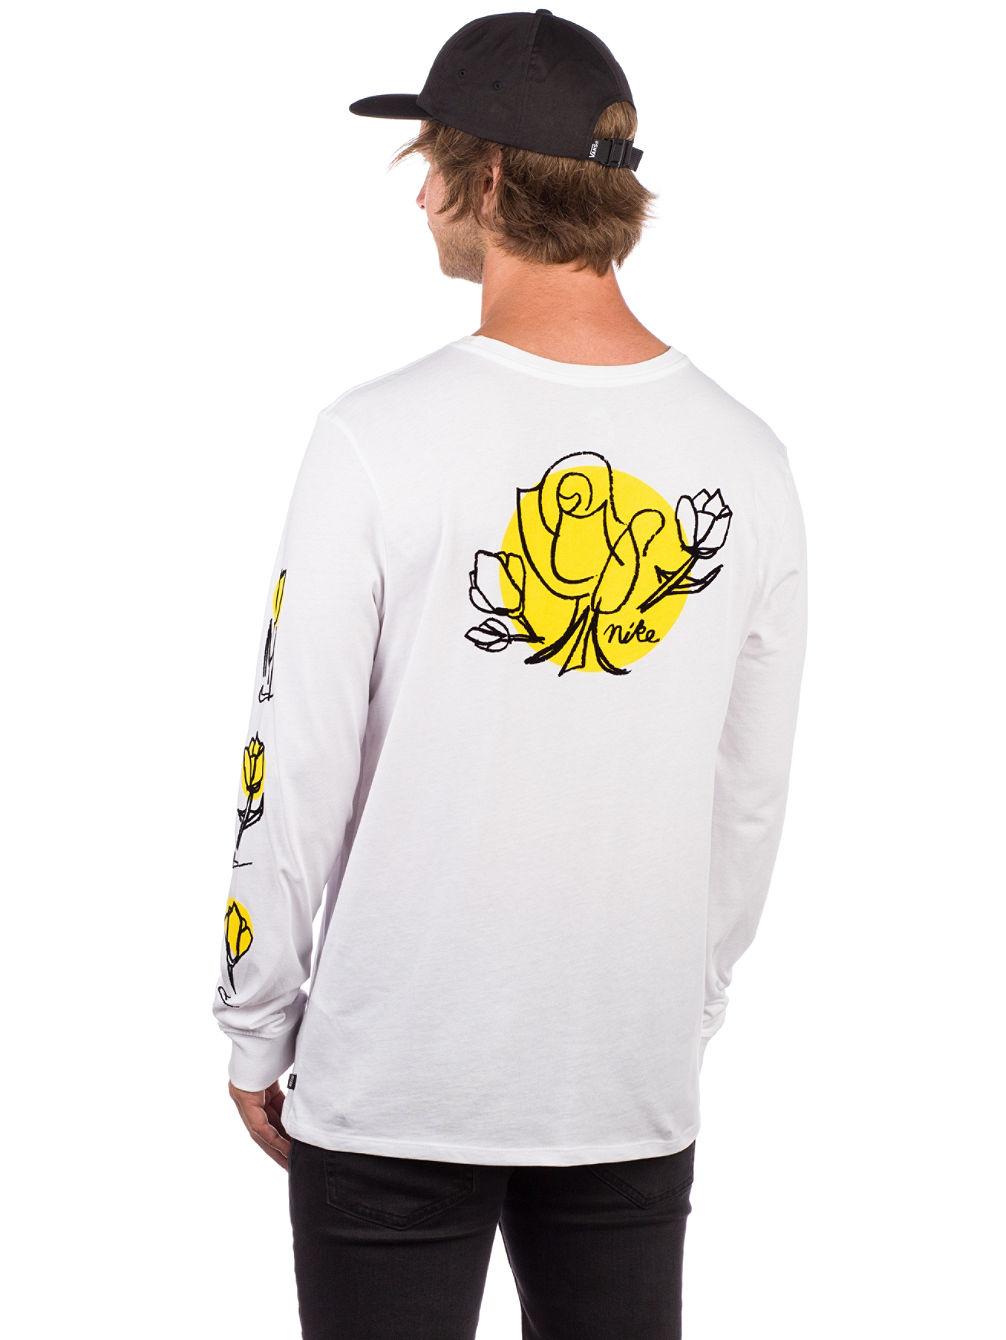 a0826205 Buy Nike SB Long Sleeve T-Shirt online at Blue Tomato